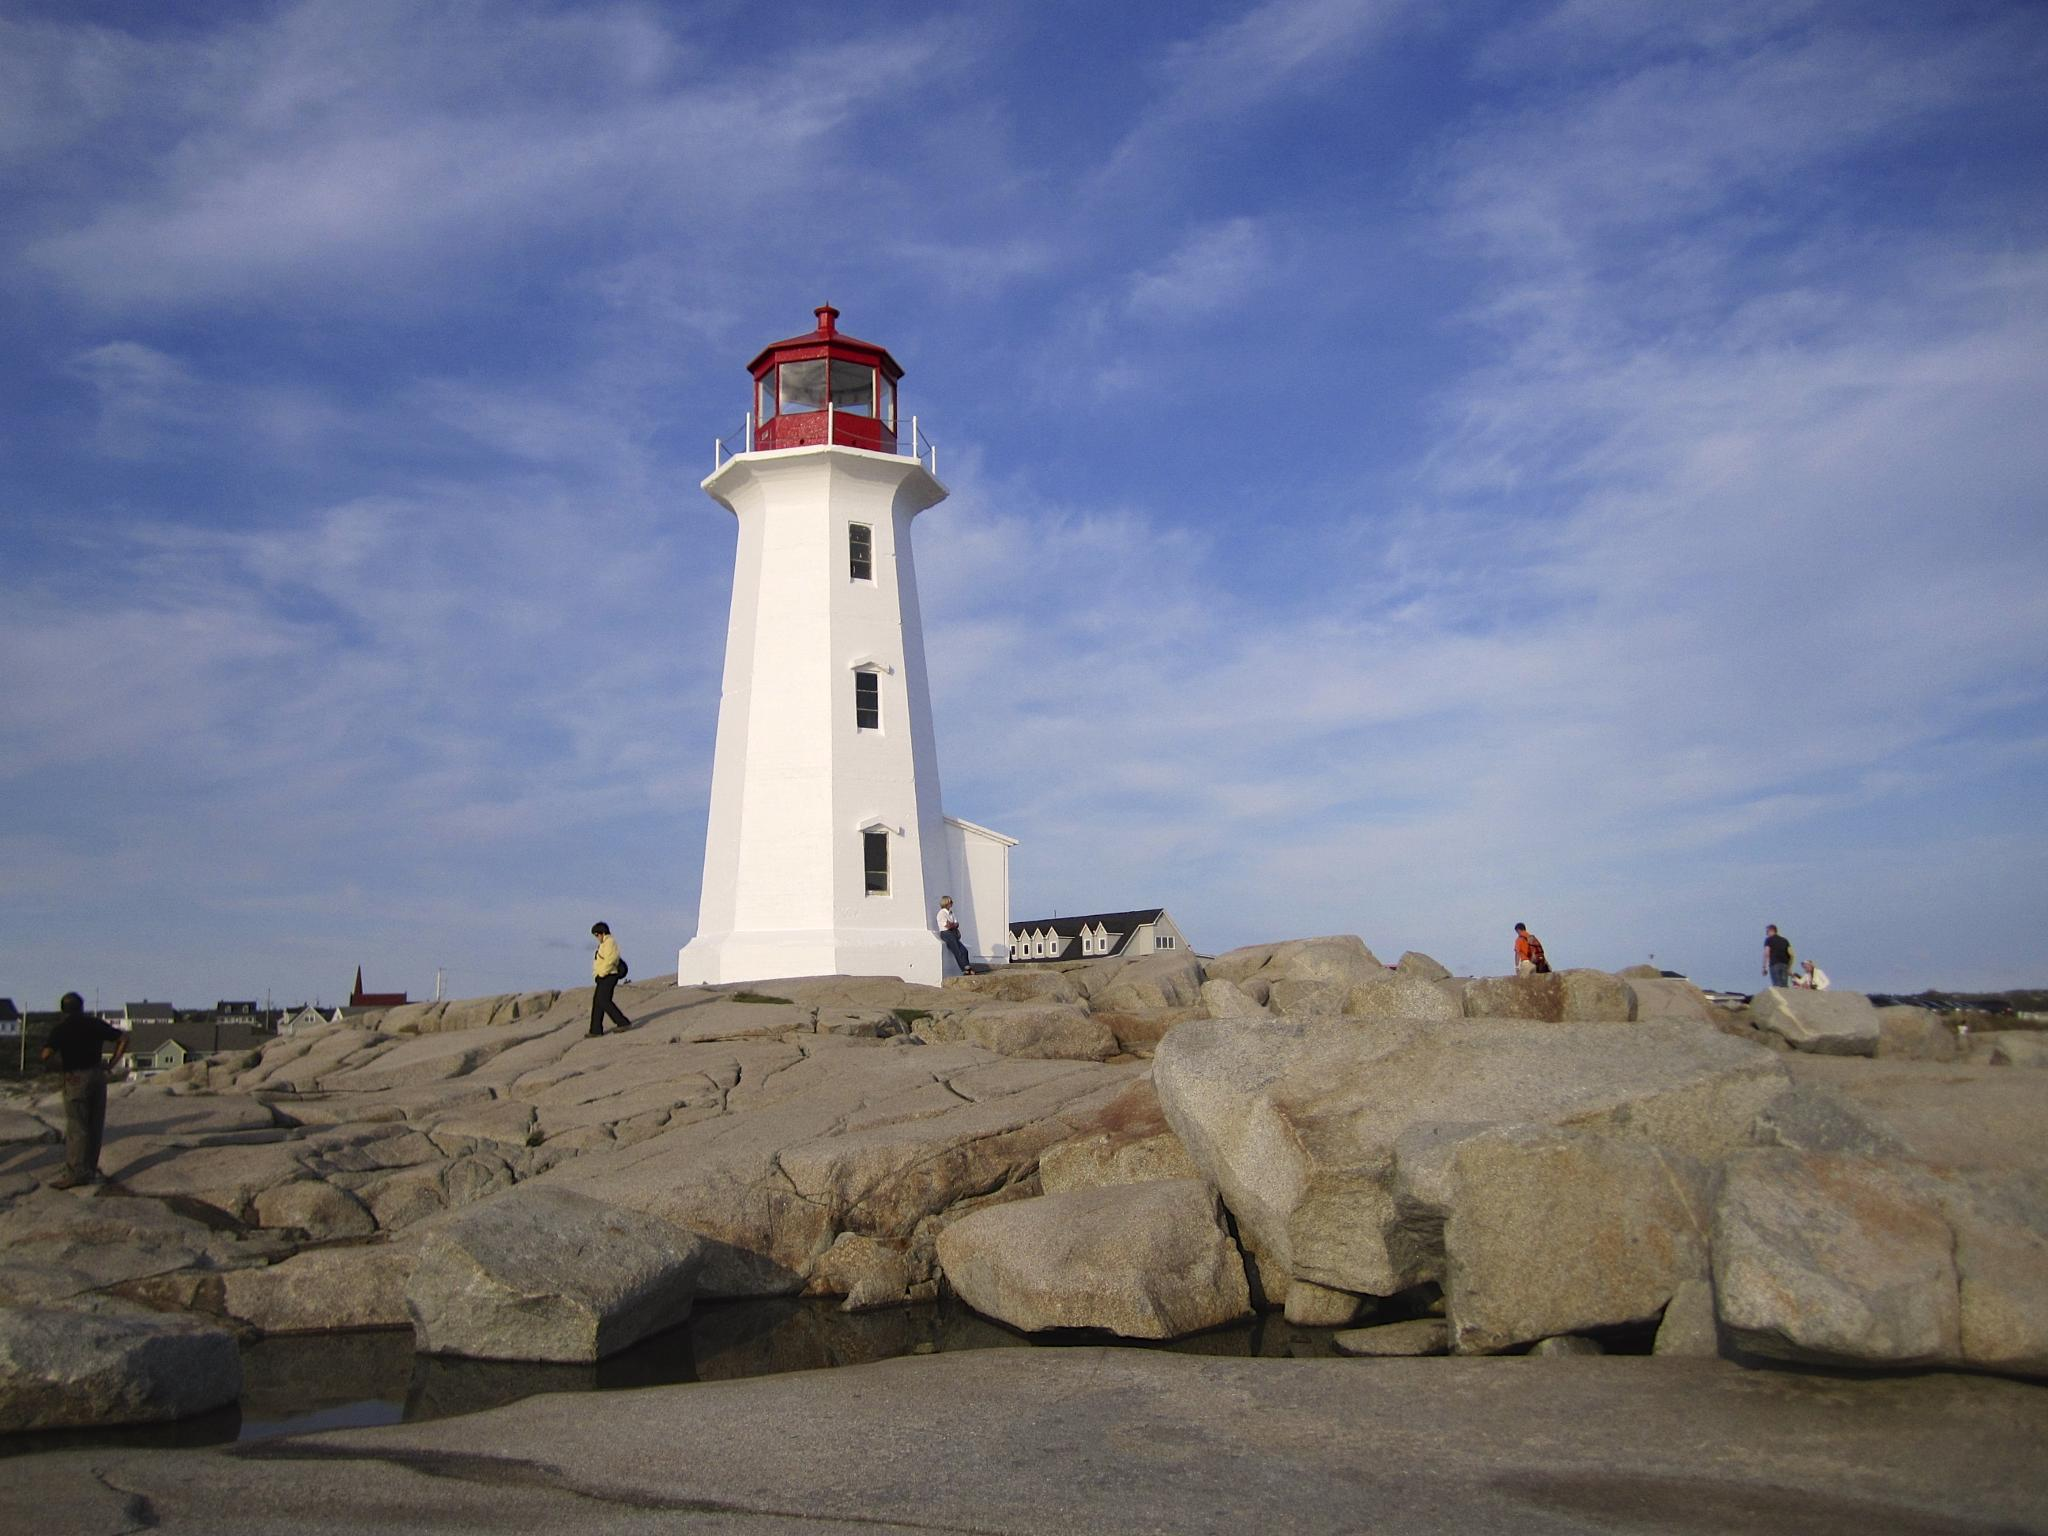 Lighthouse by gerry.lewicki